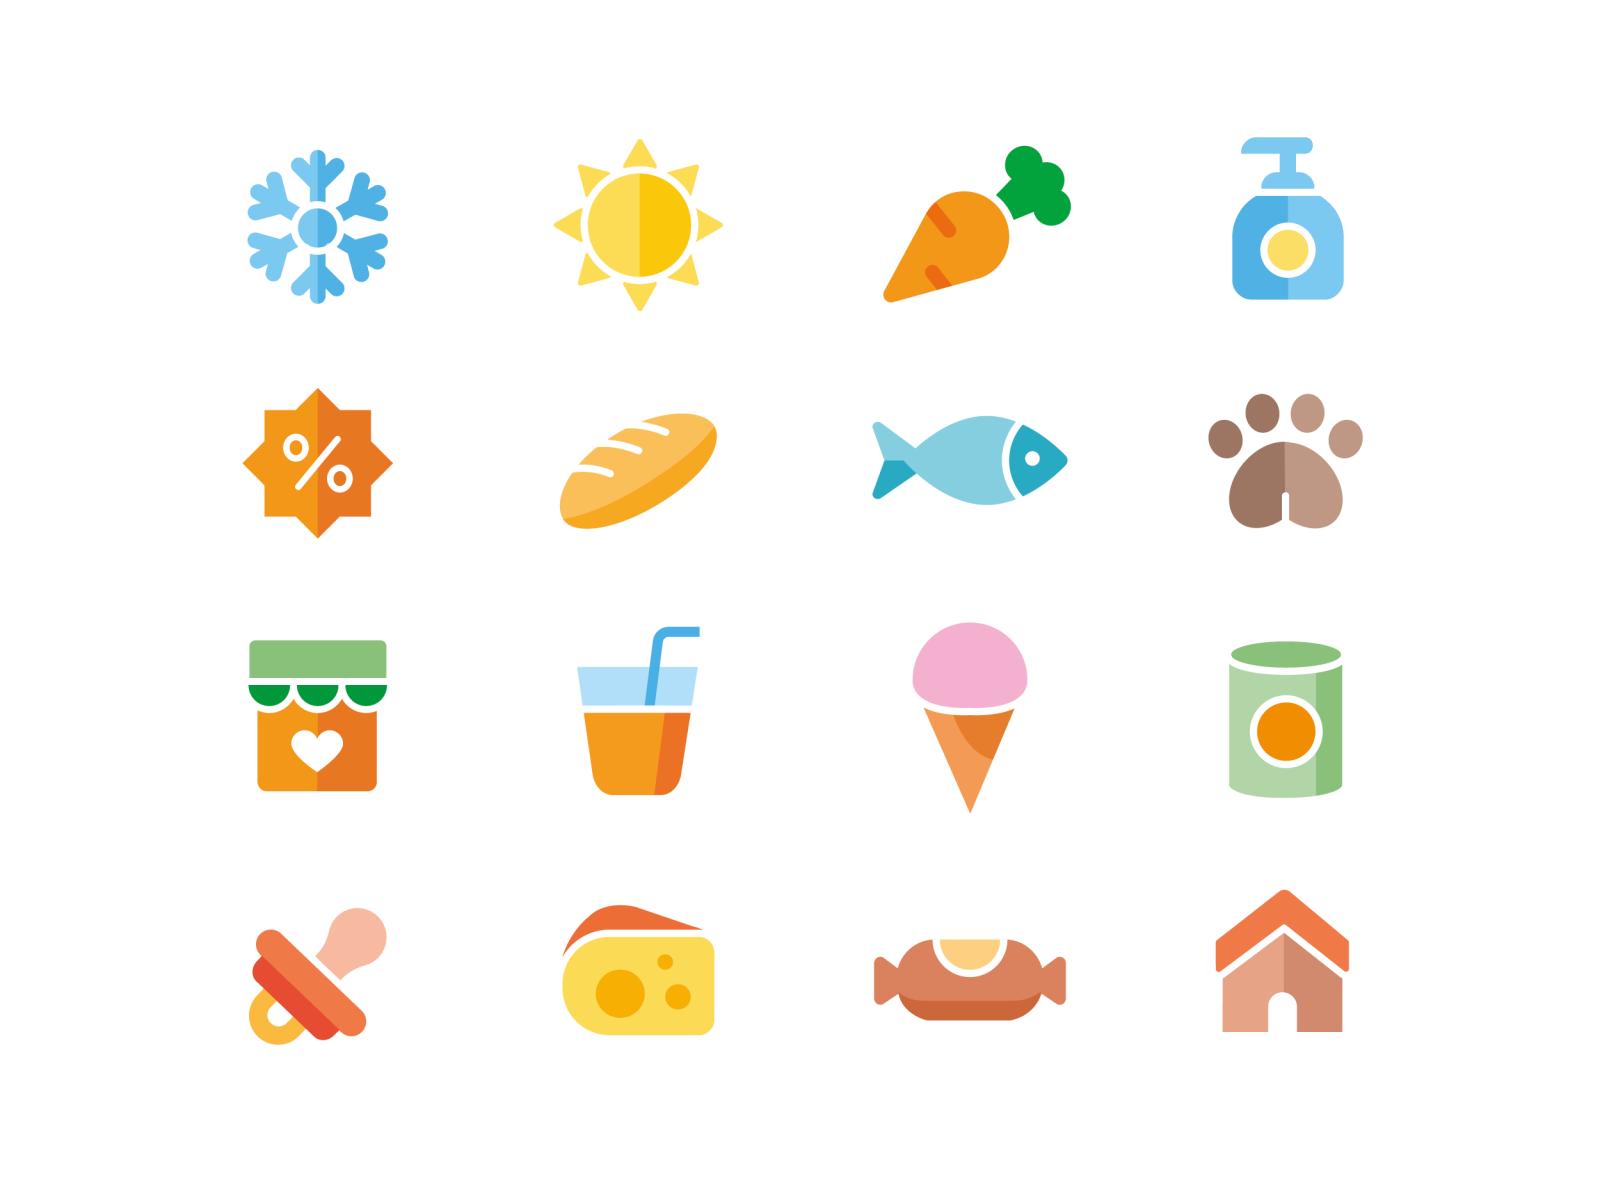 Dribbble shots icons